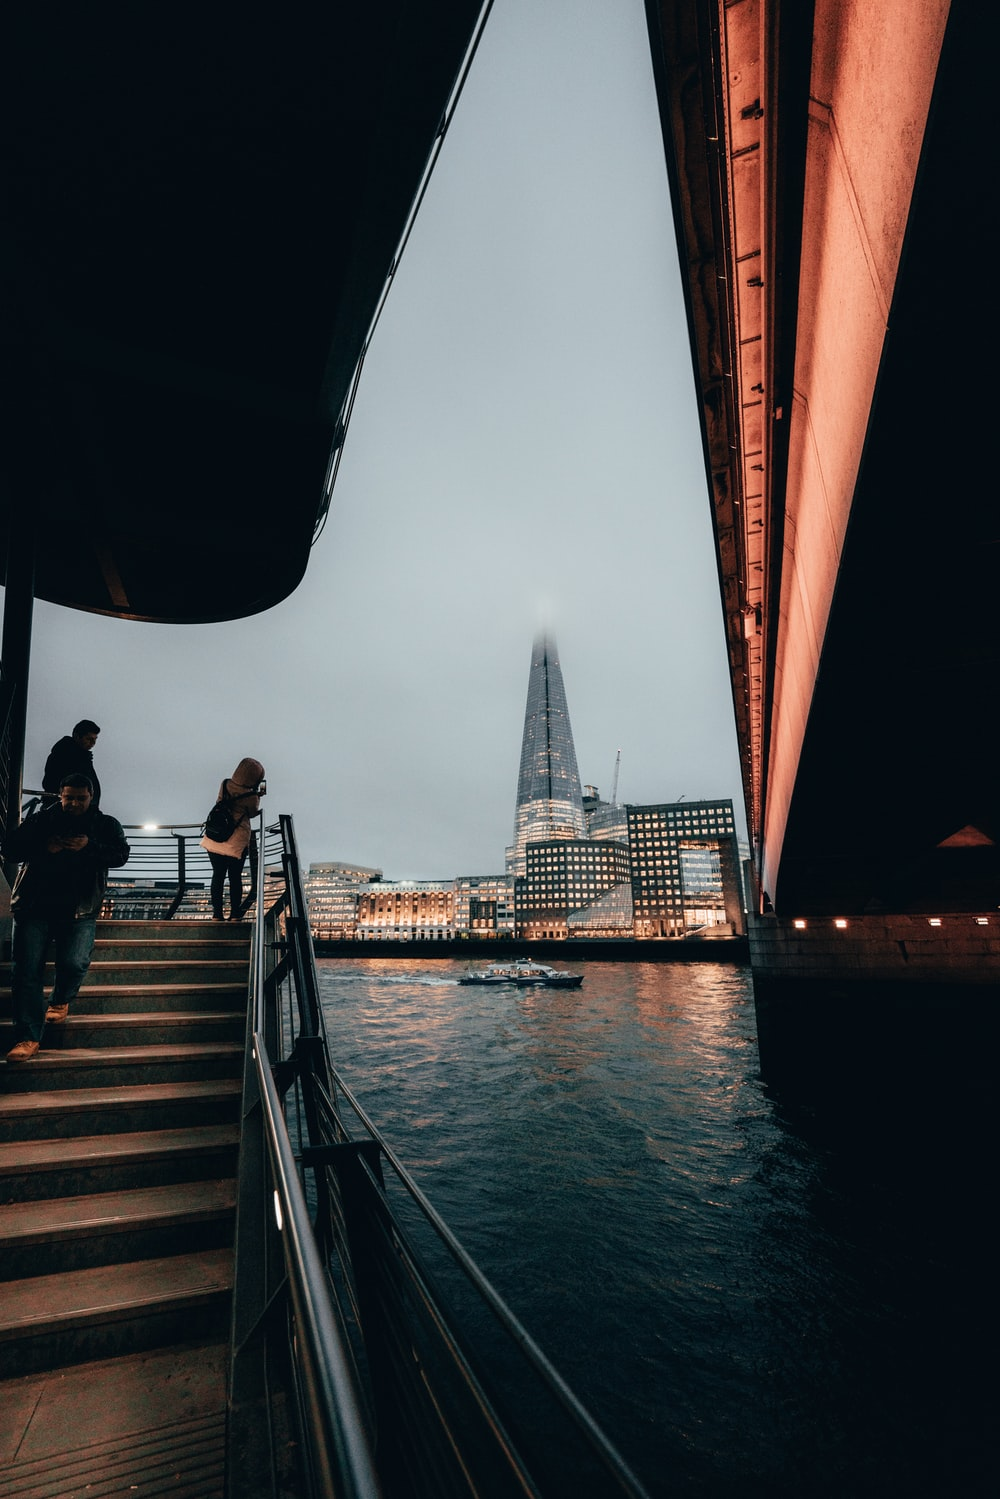 people standing on boat under bridge